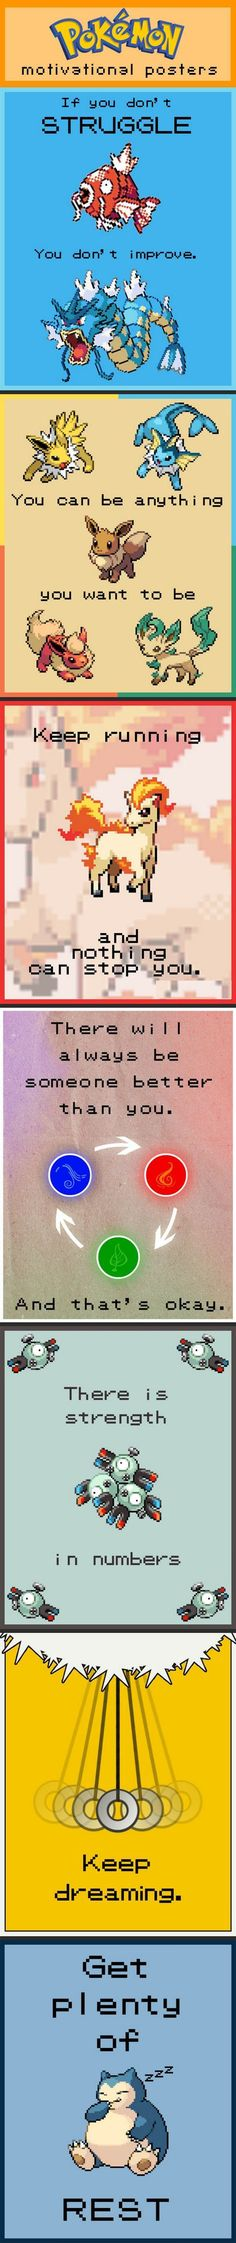 Pokemon Motivational Posters